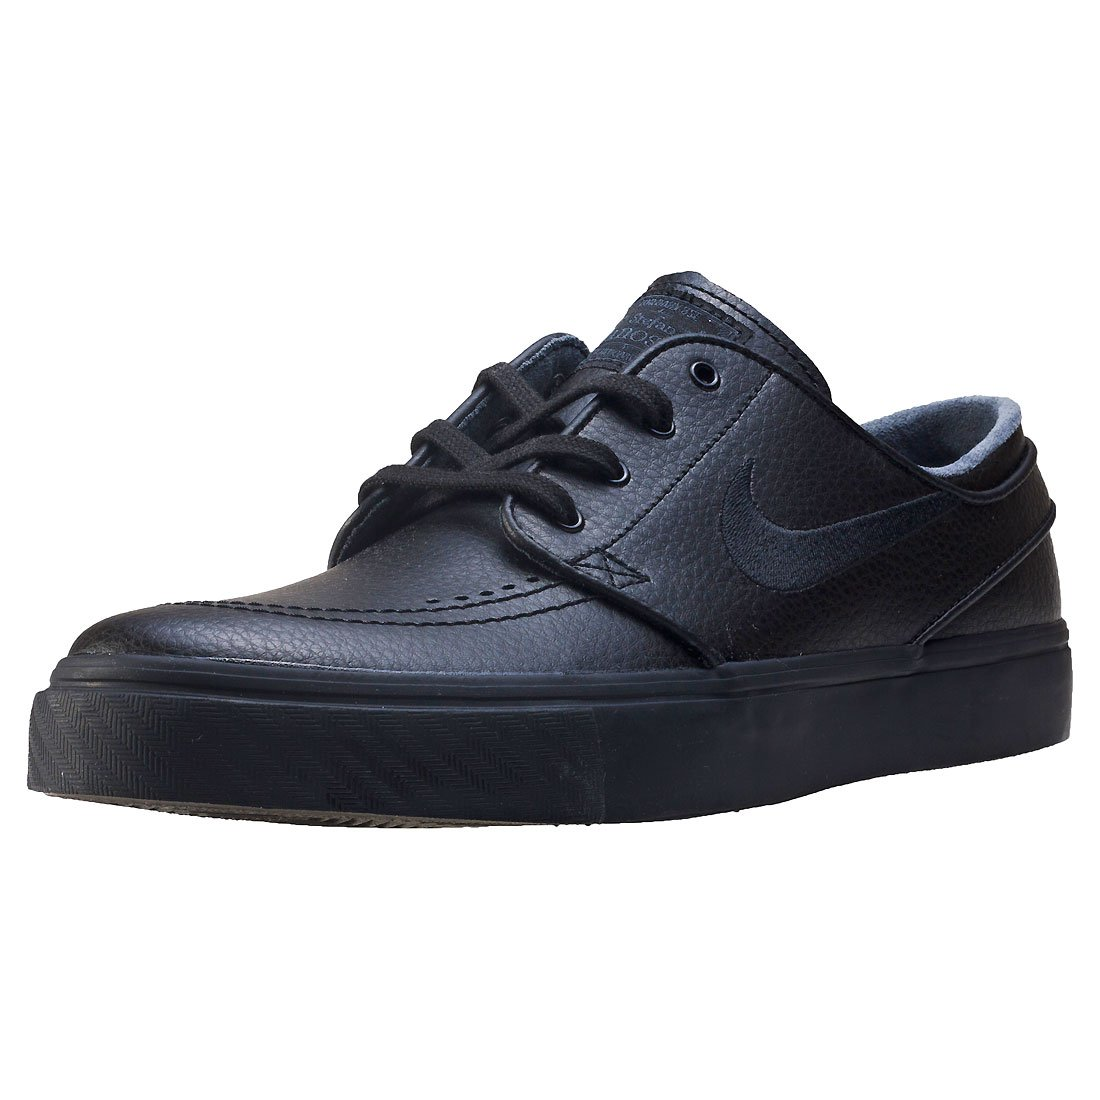 NIKE Men's Zoom Stefan Janoski Skate Shoe B01INZQSMM 4.5 D(M) US|Black/Black Black Anthracite